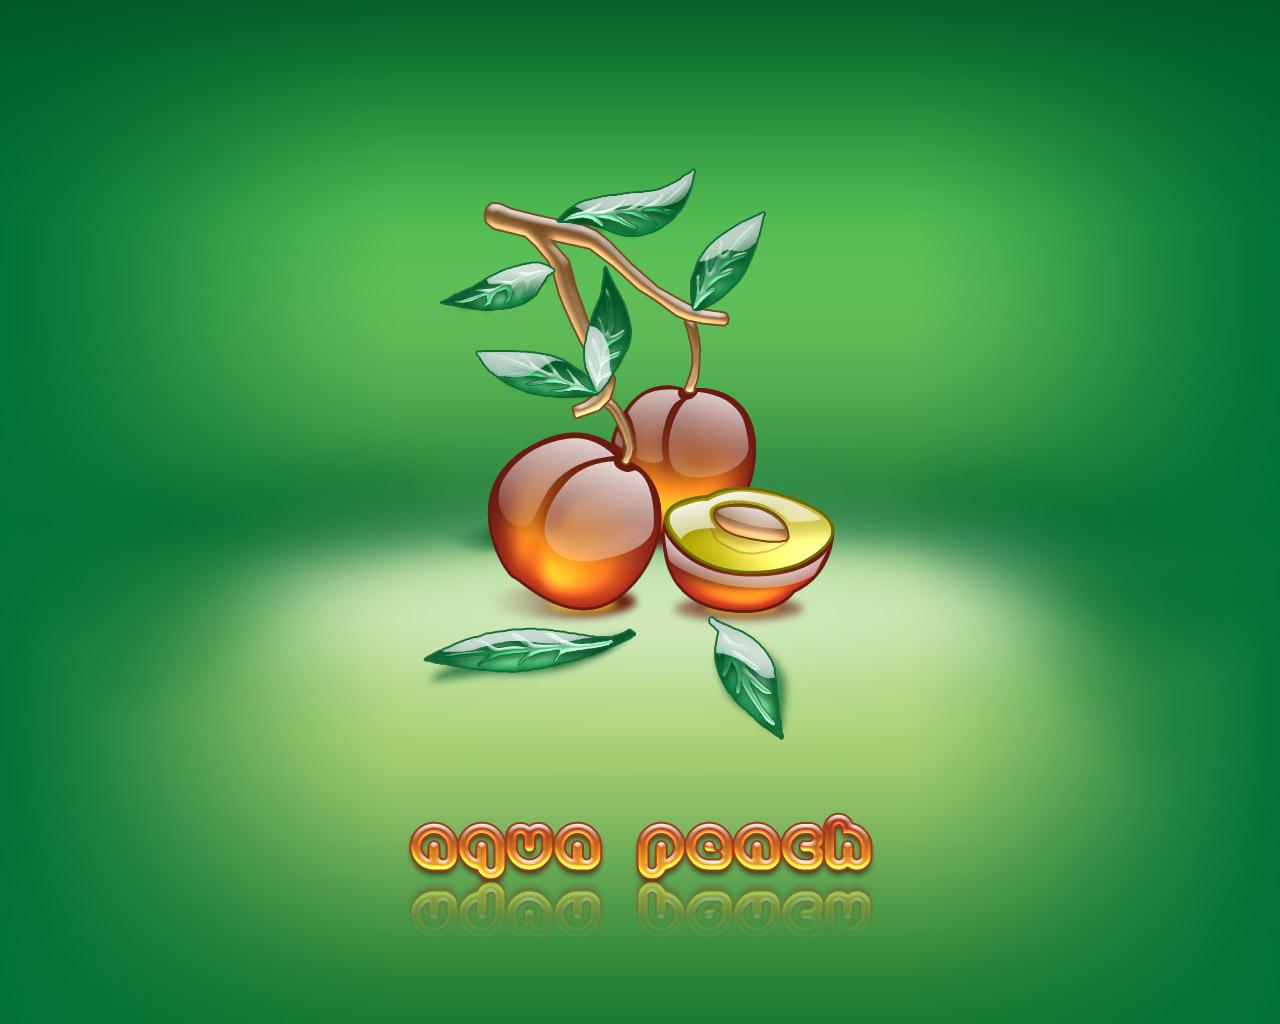 http://1.bp.blogspot.com/-NunZKU5fn0g/TisktCIm-WI/AAAAAAAAIHM/3mGEoEA57t0/s1600/CBAW.co.cc+Aqua+Peach+%25284%2529.jpg